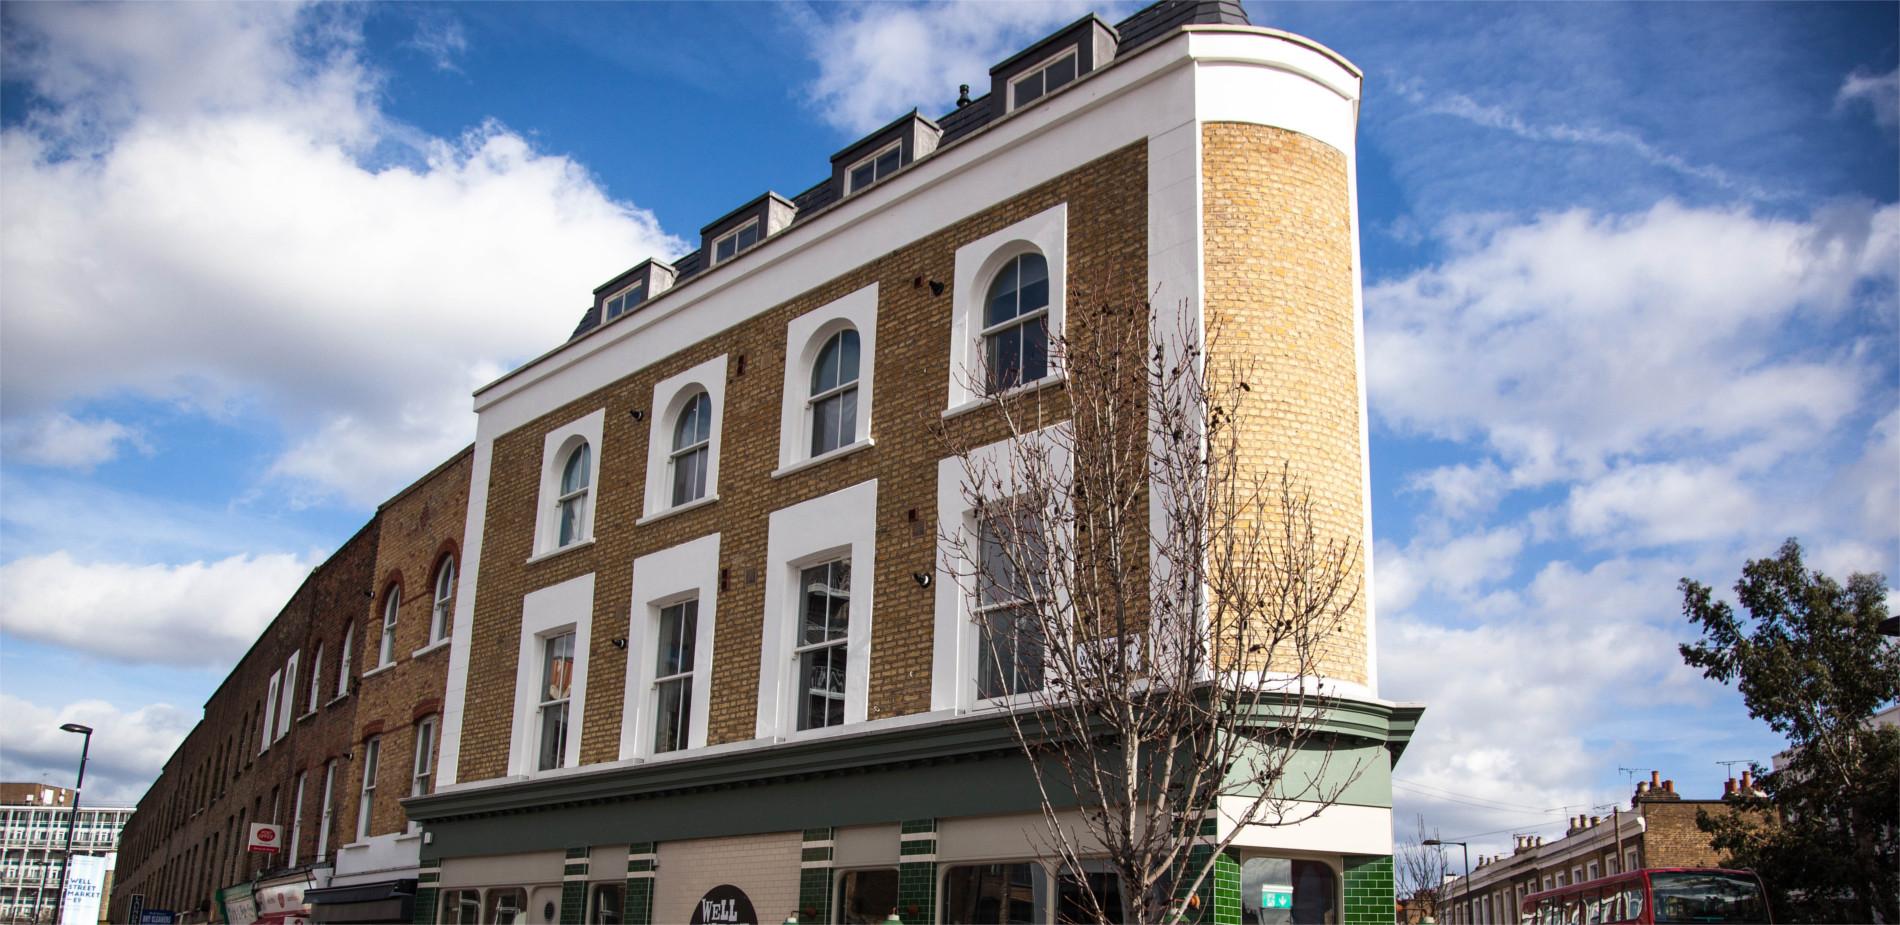 Windows Wells Street, London